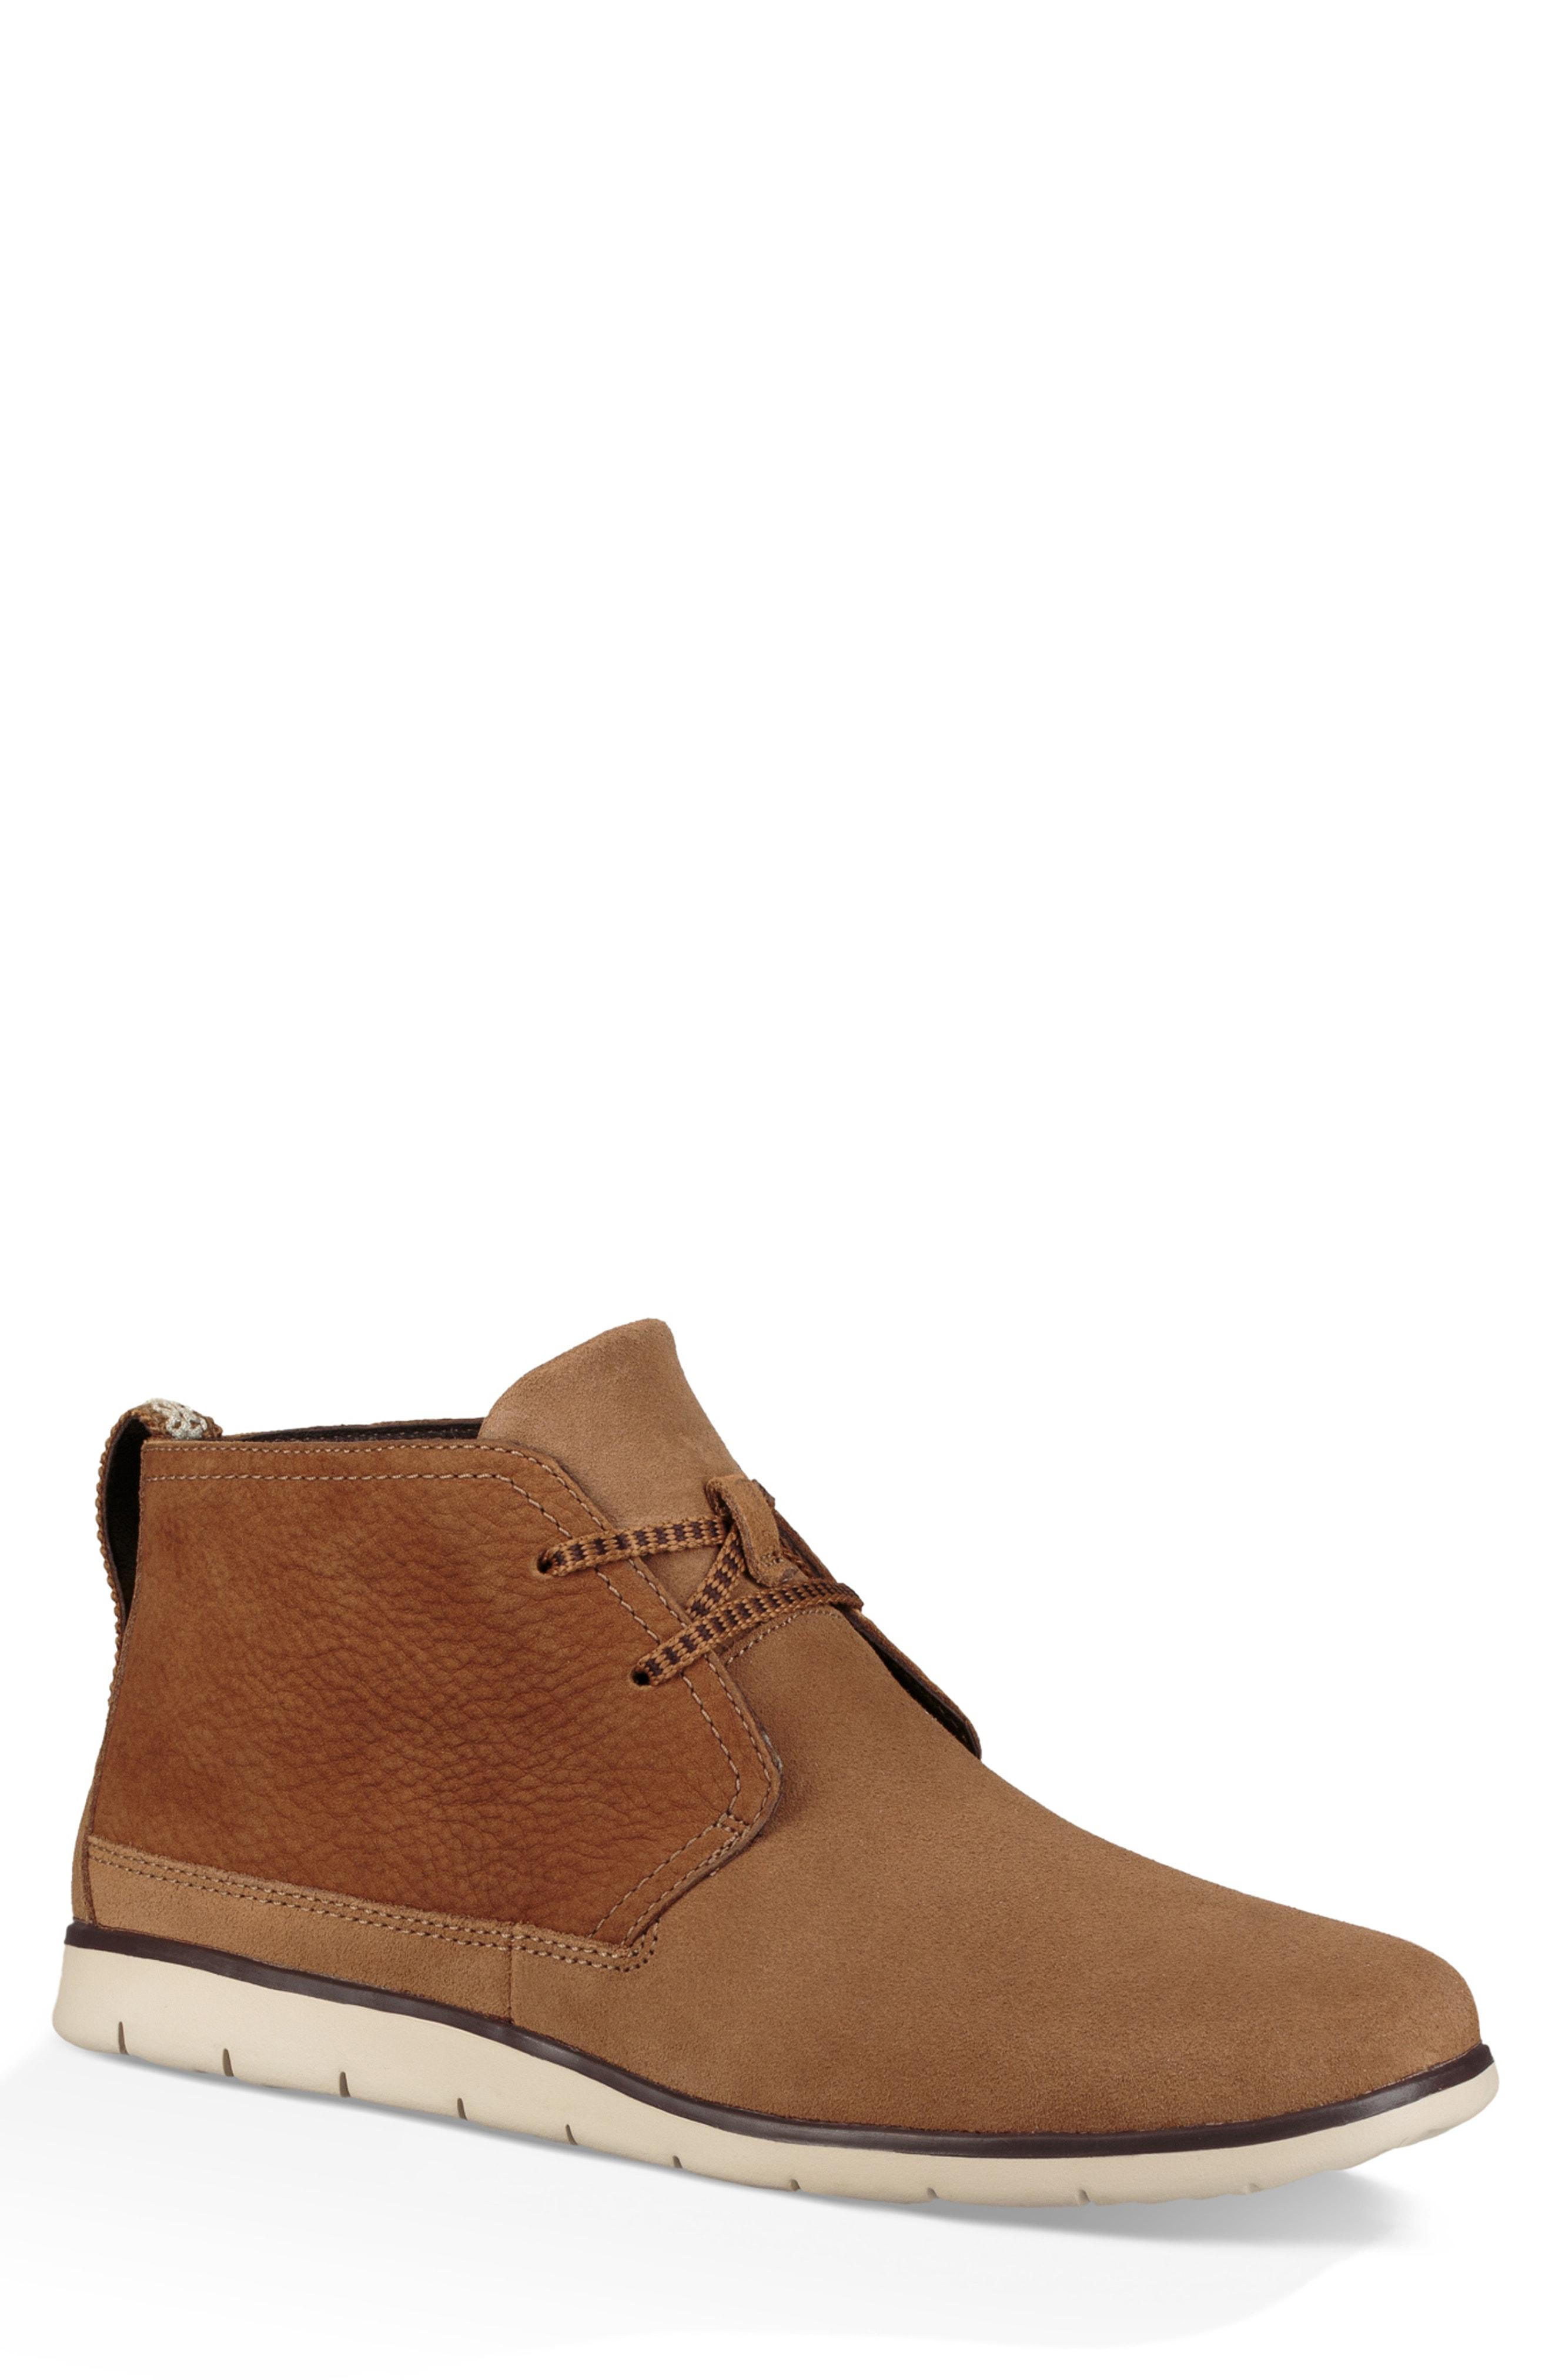 0a21e0307c5 Men's Ugg Freamon Waterproof Chukka Boot, Size 7 M - Brown